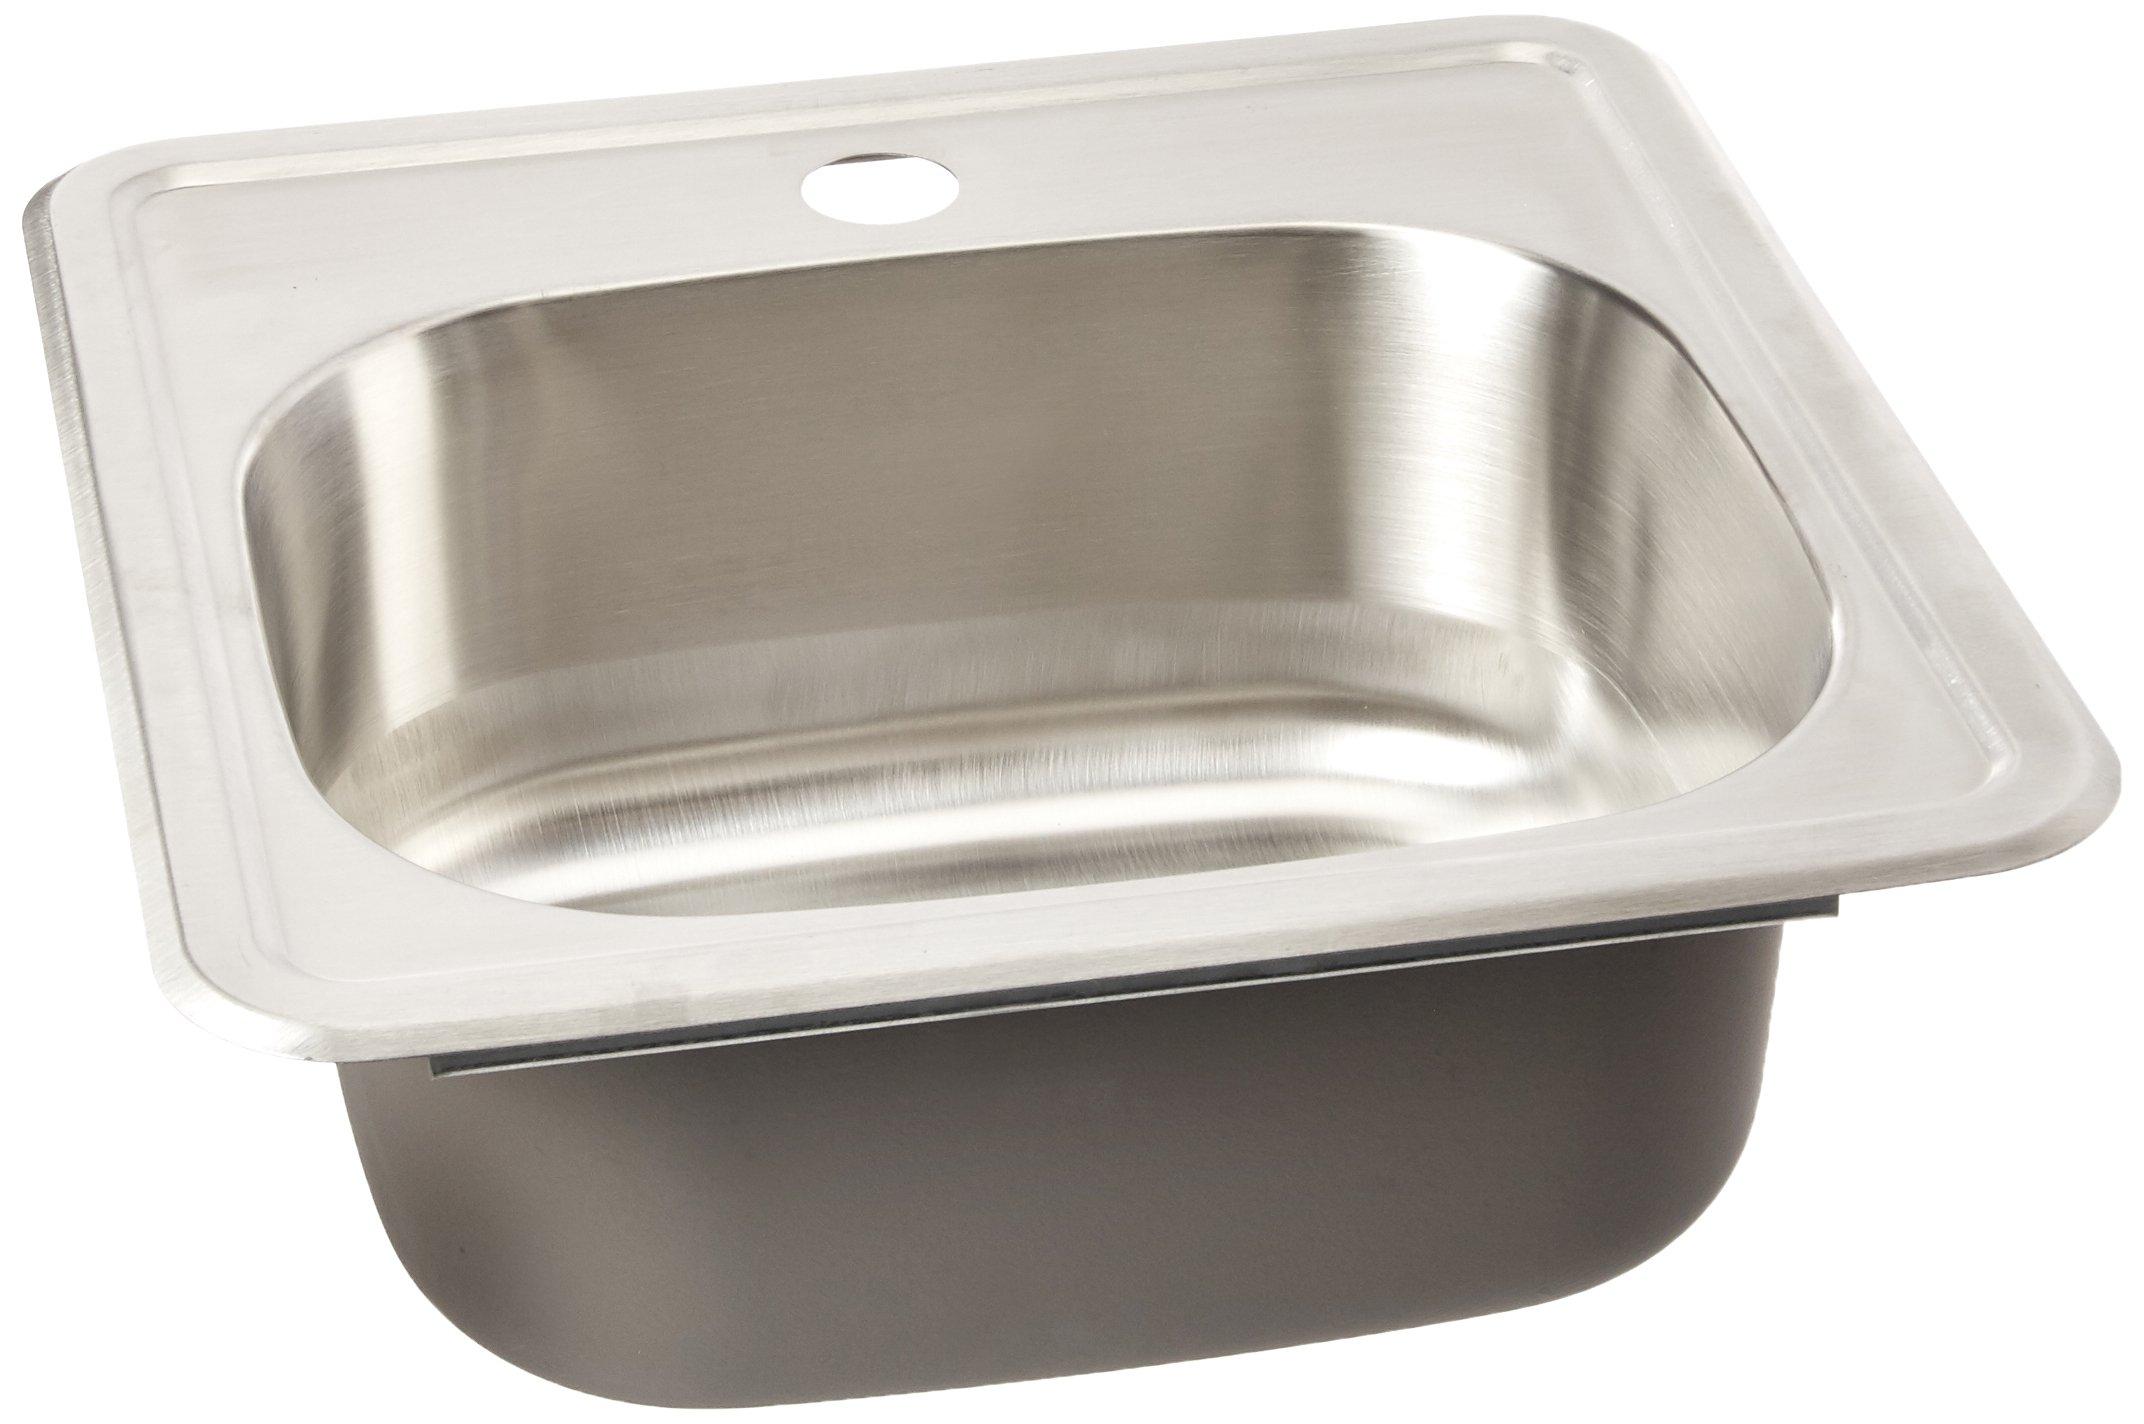 Wells Sinkware CMT1515-6 22 gauge Single Bowl Top-Mount Kitchen Sink, Stainless Steel